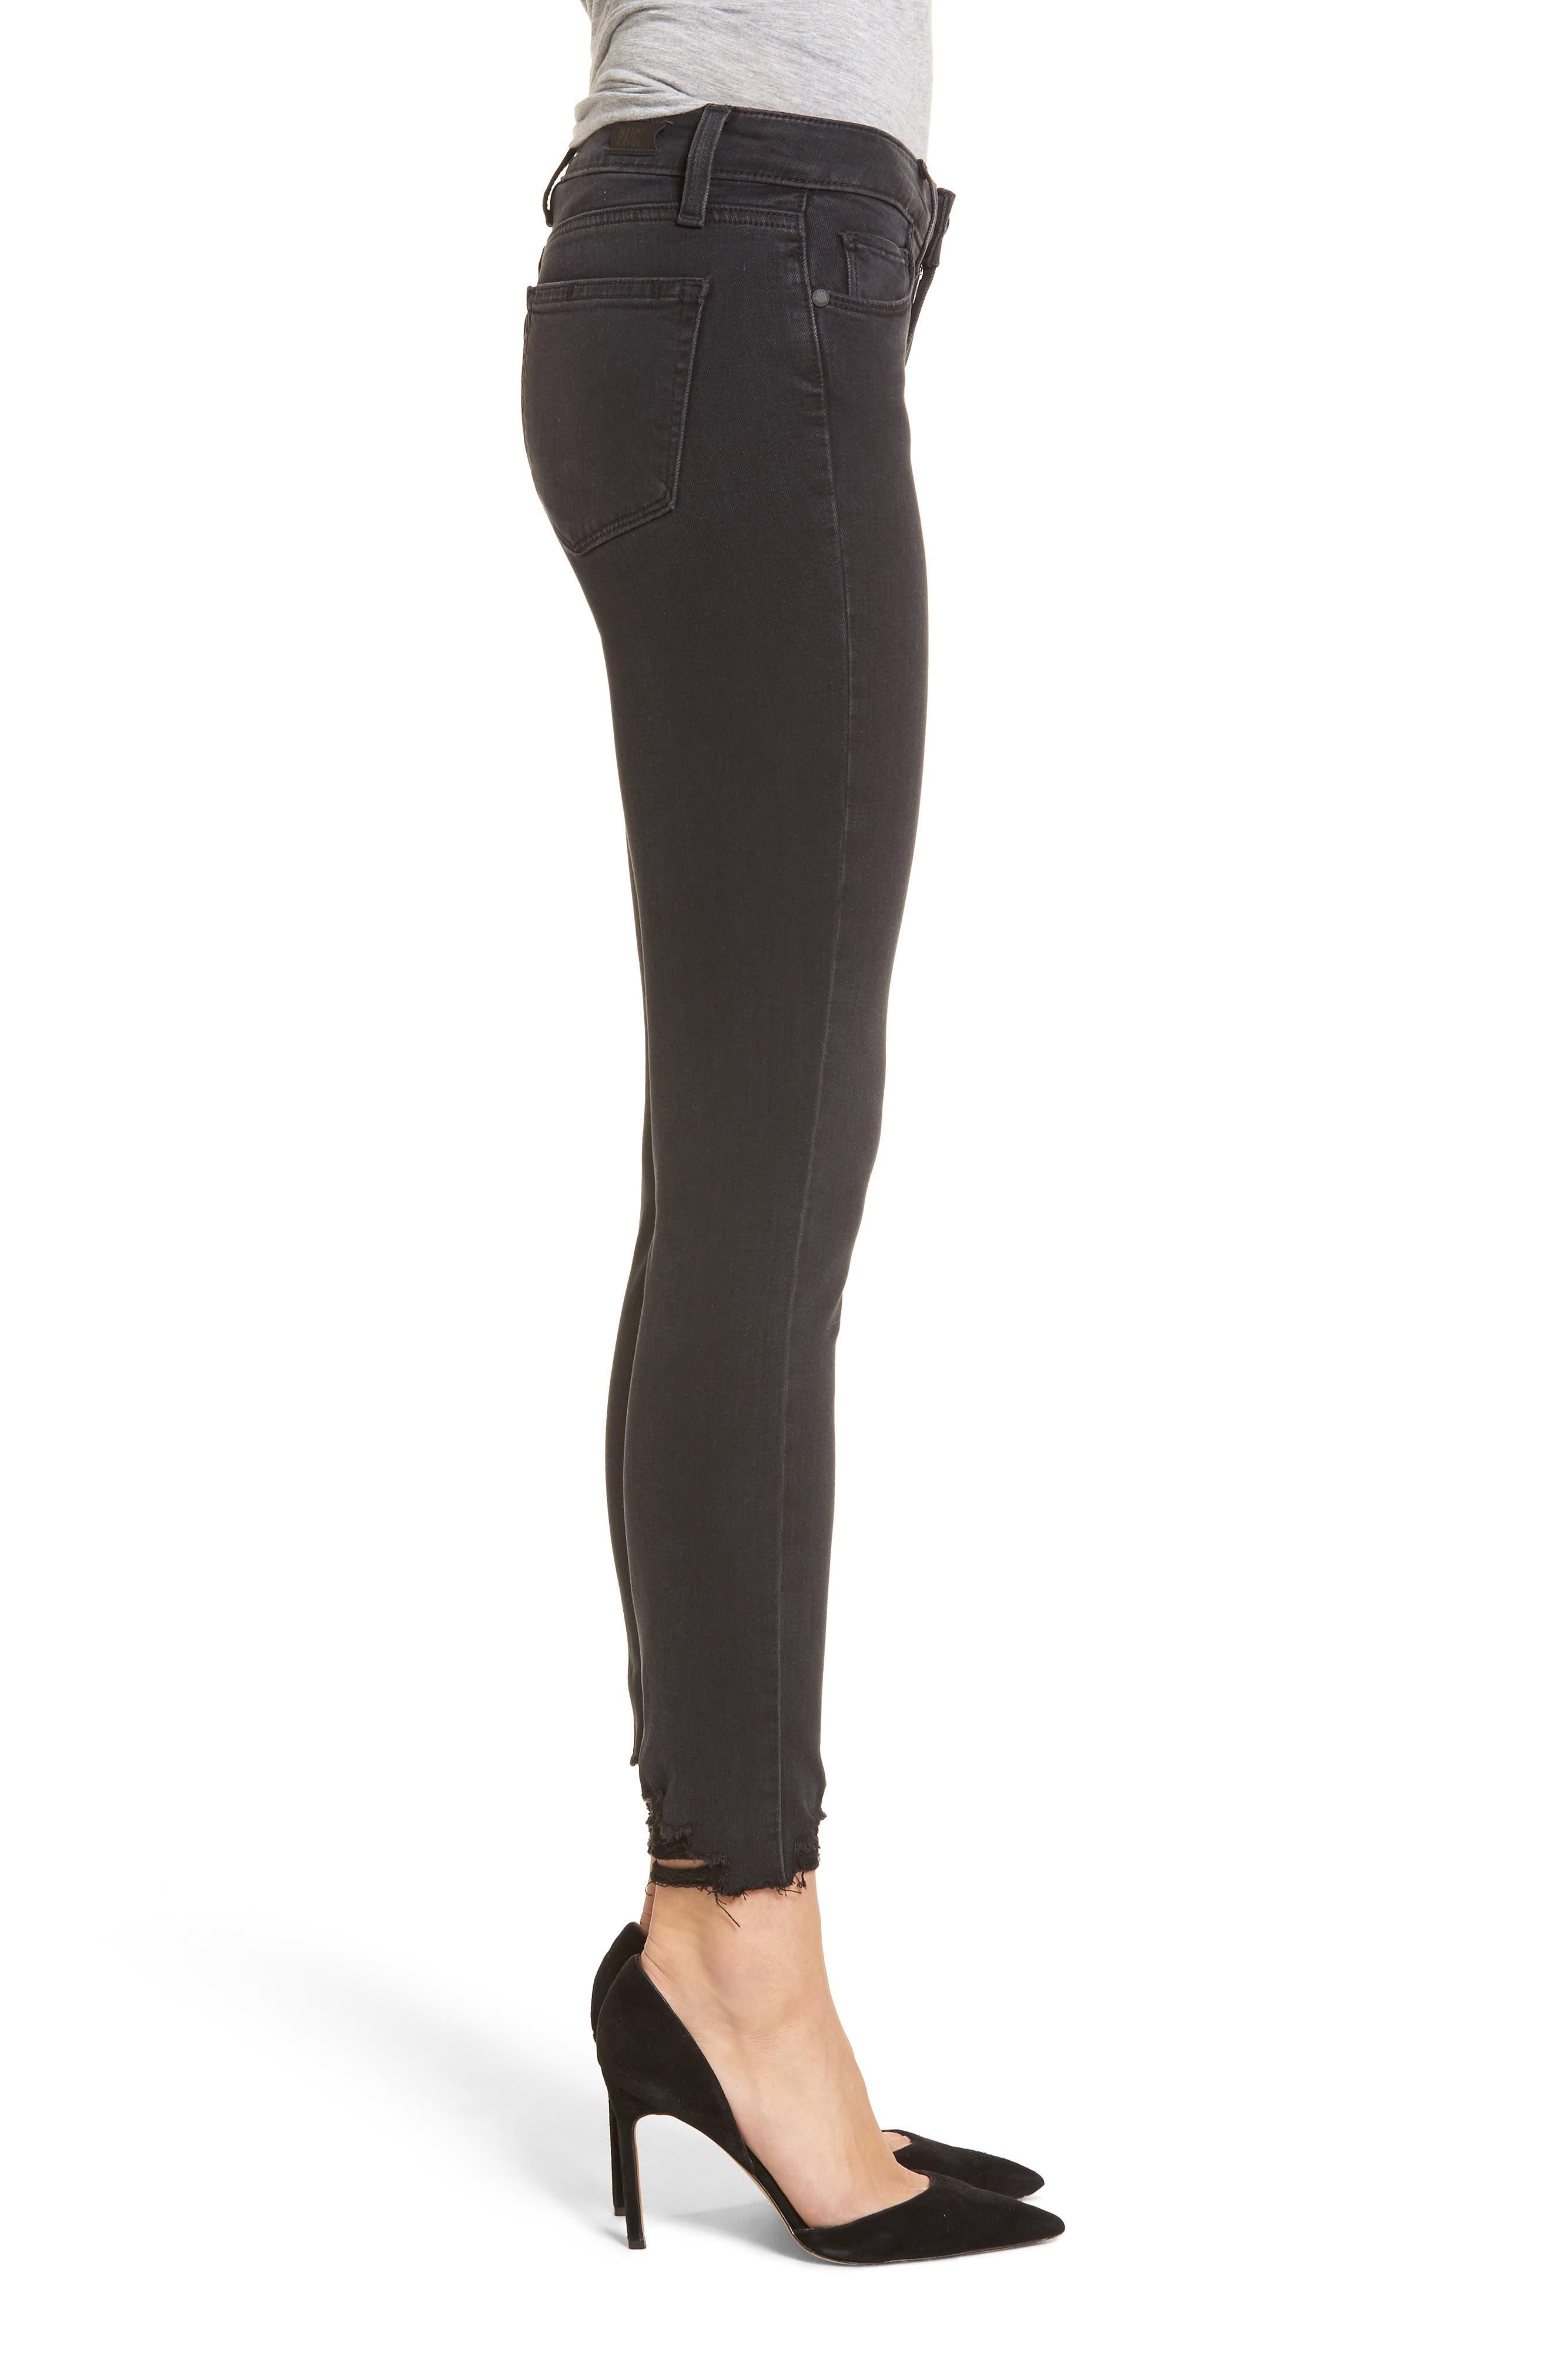 Transcend - Verdugo Ankle Skinny Jeans,                             Alternate thumbnail 3, color,                             Black Fog Super Distressed